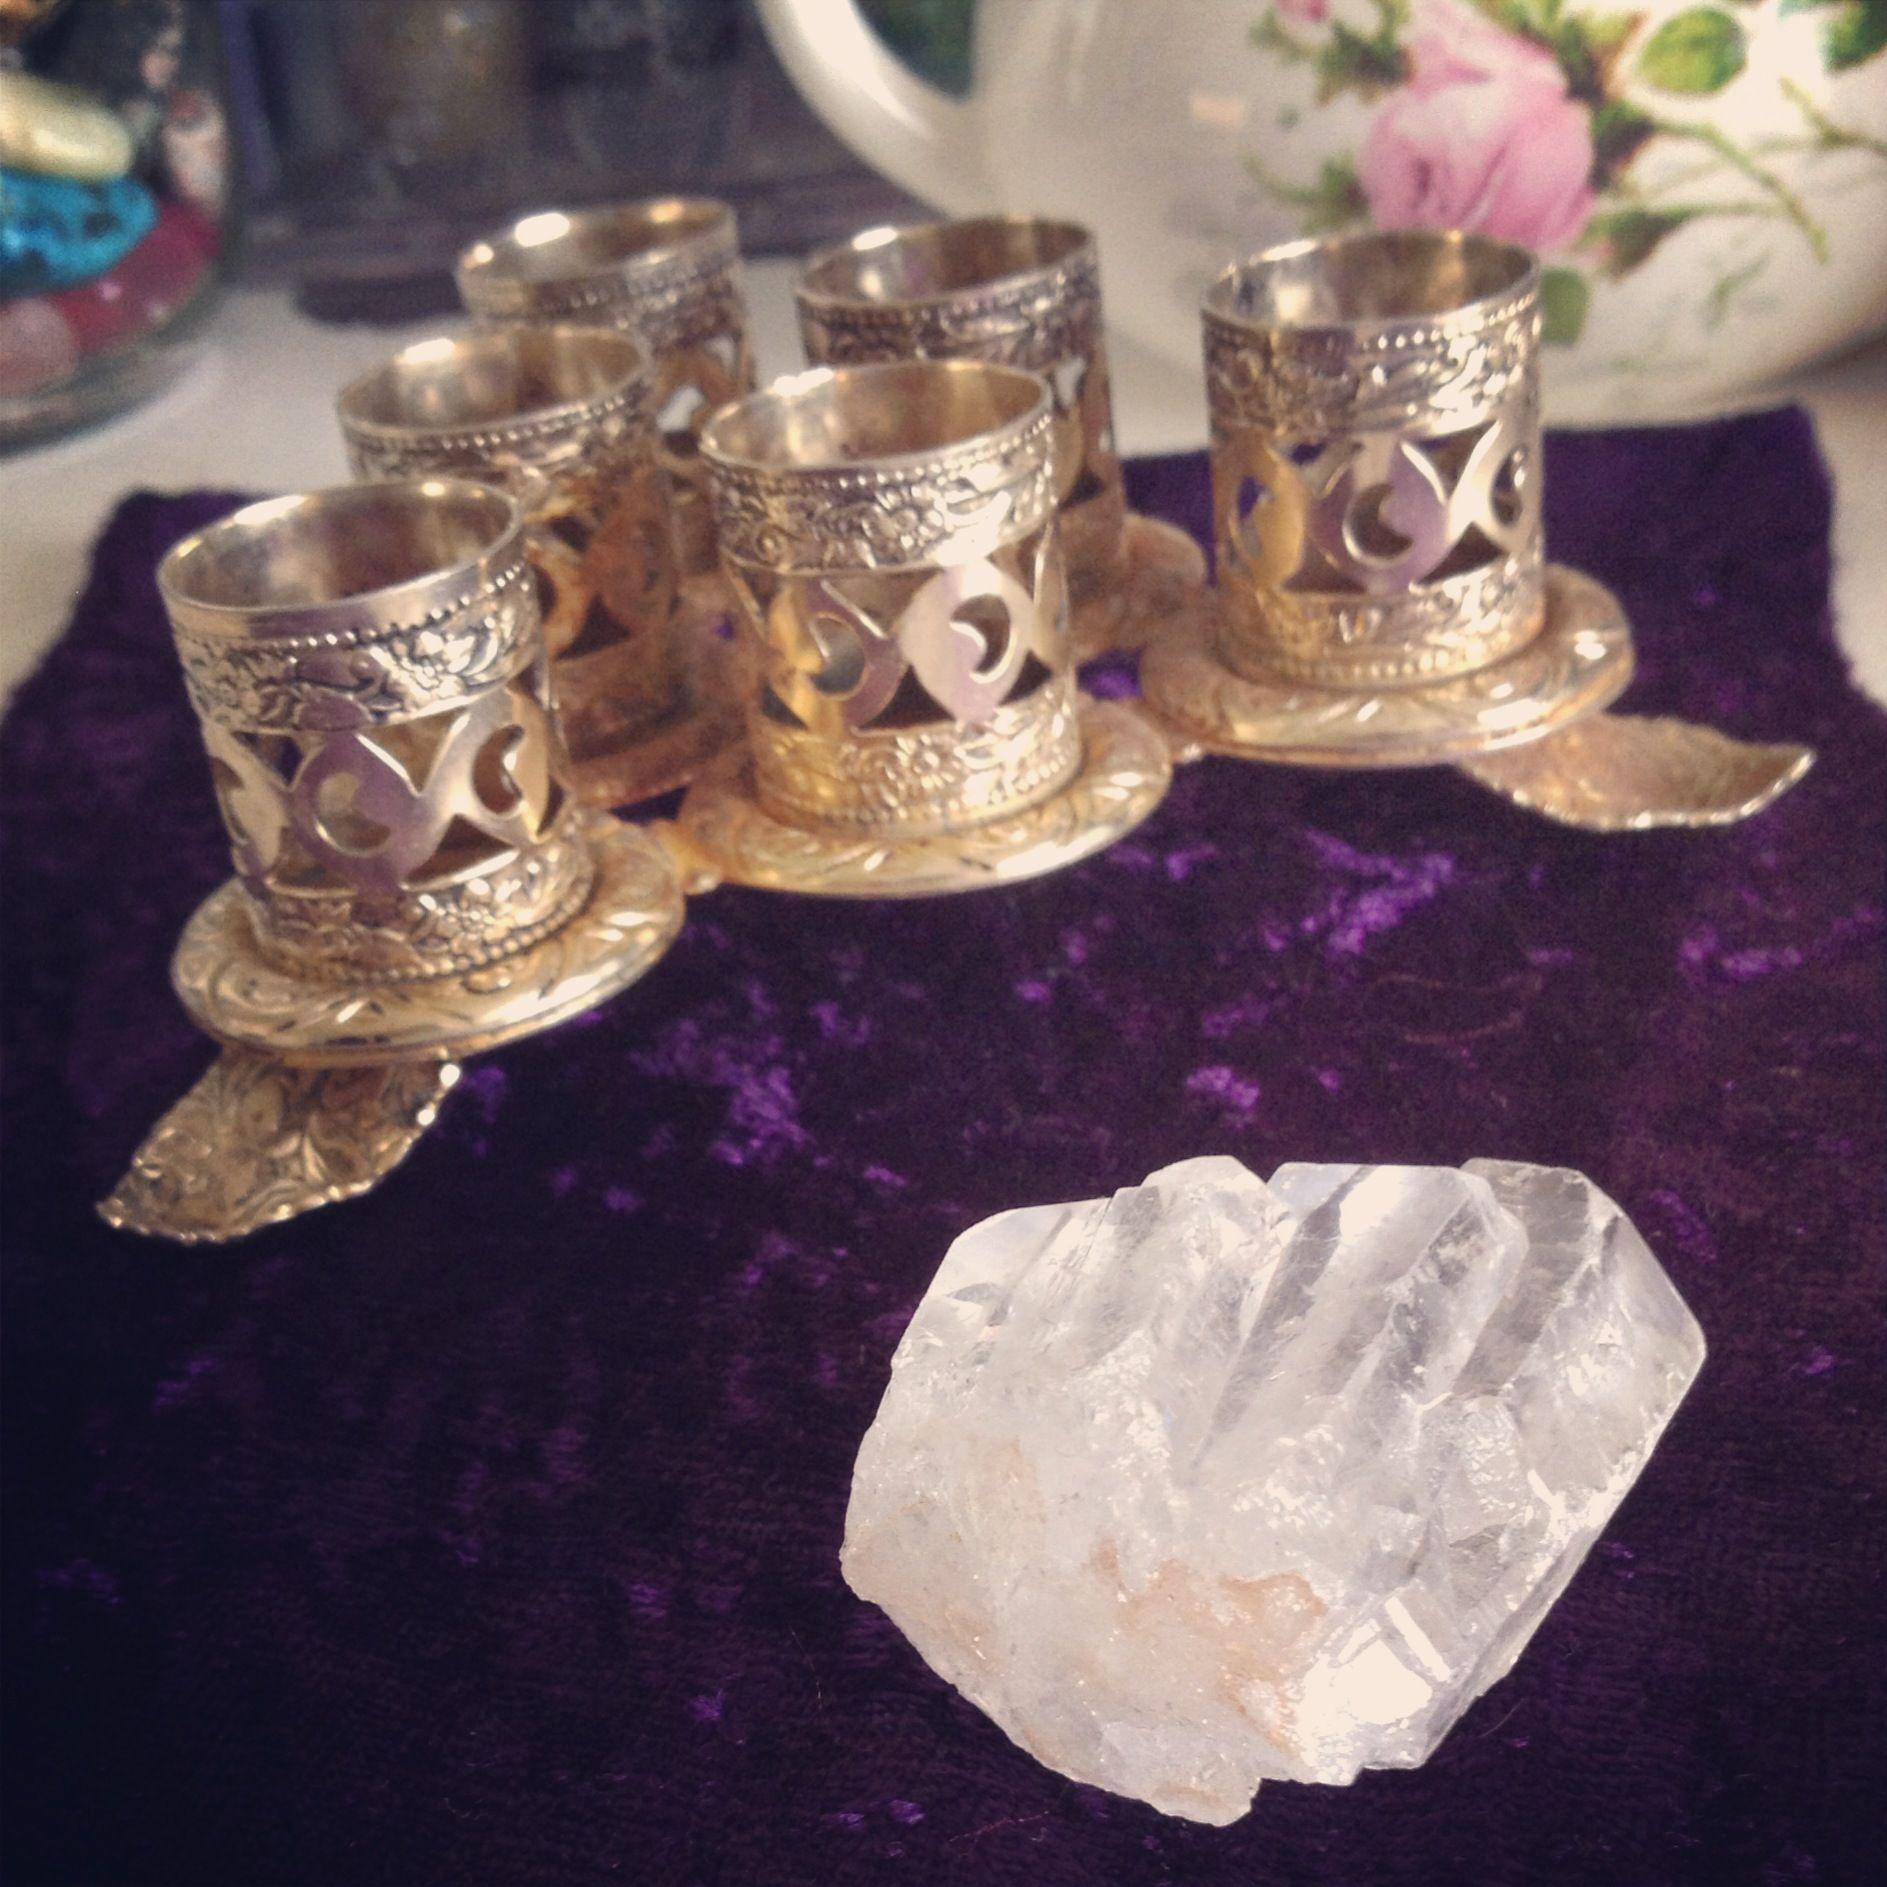 Simple gifts can be some of the best <3 #quartz #crystal #crystalquartz #vintage #lipstick holder #velvet